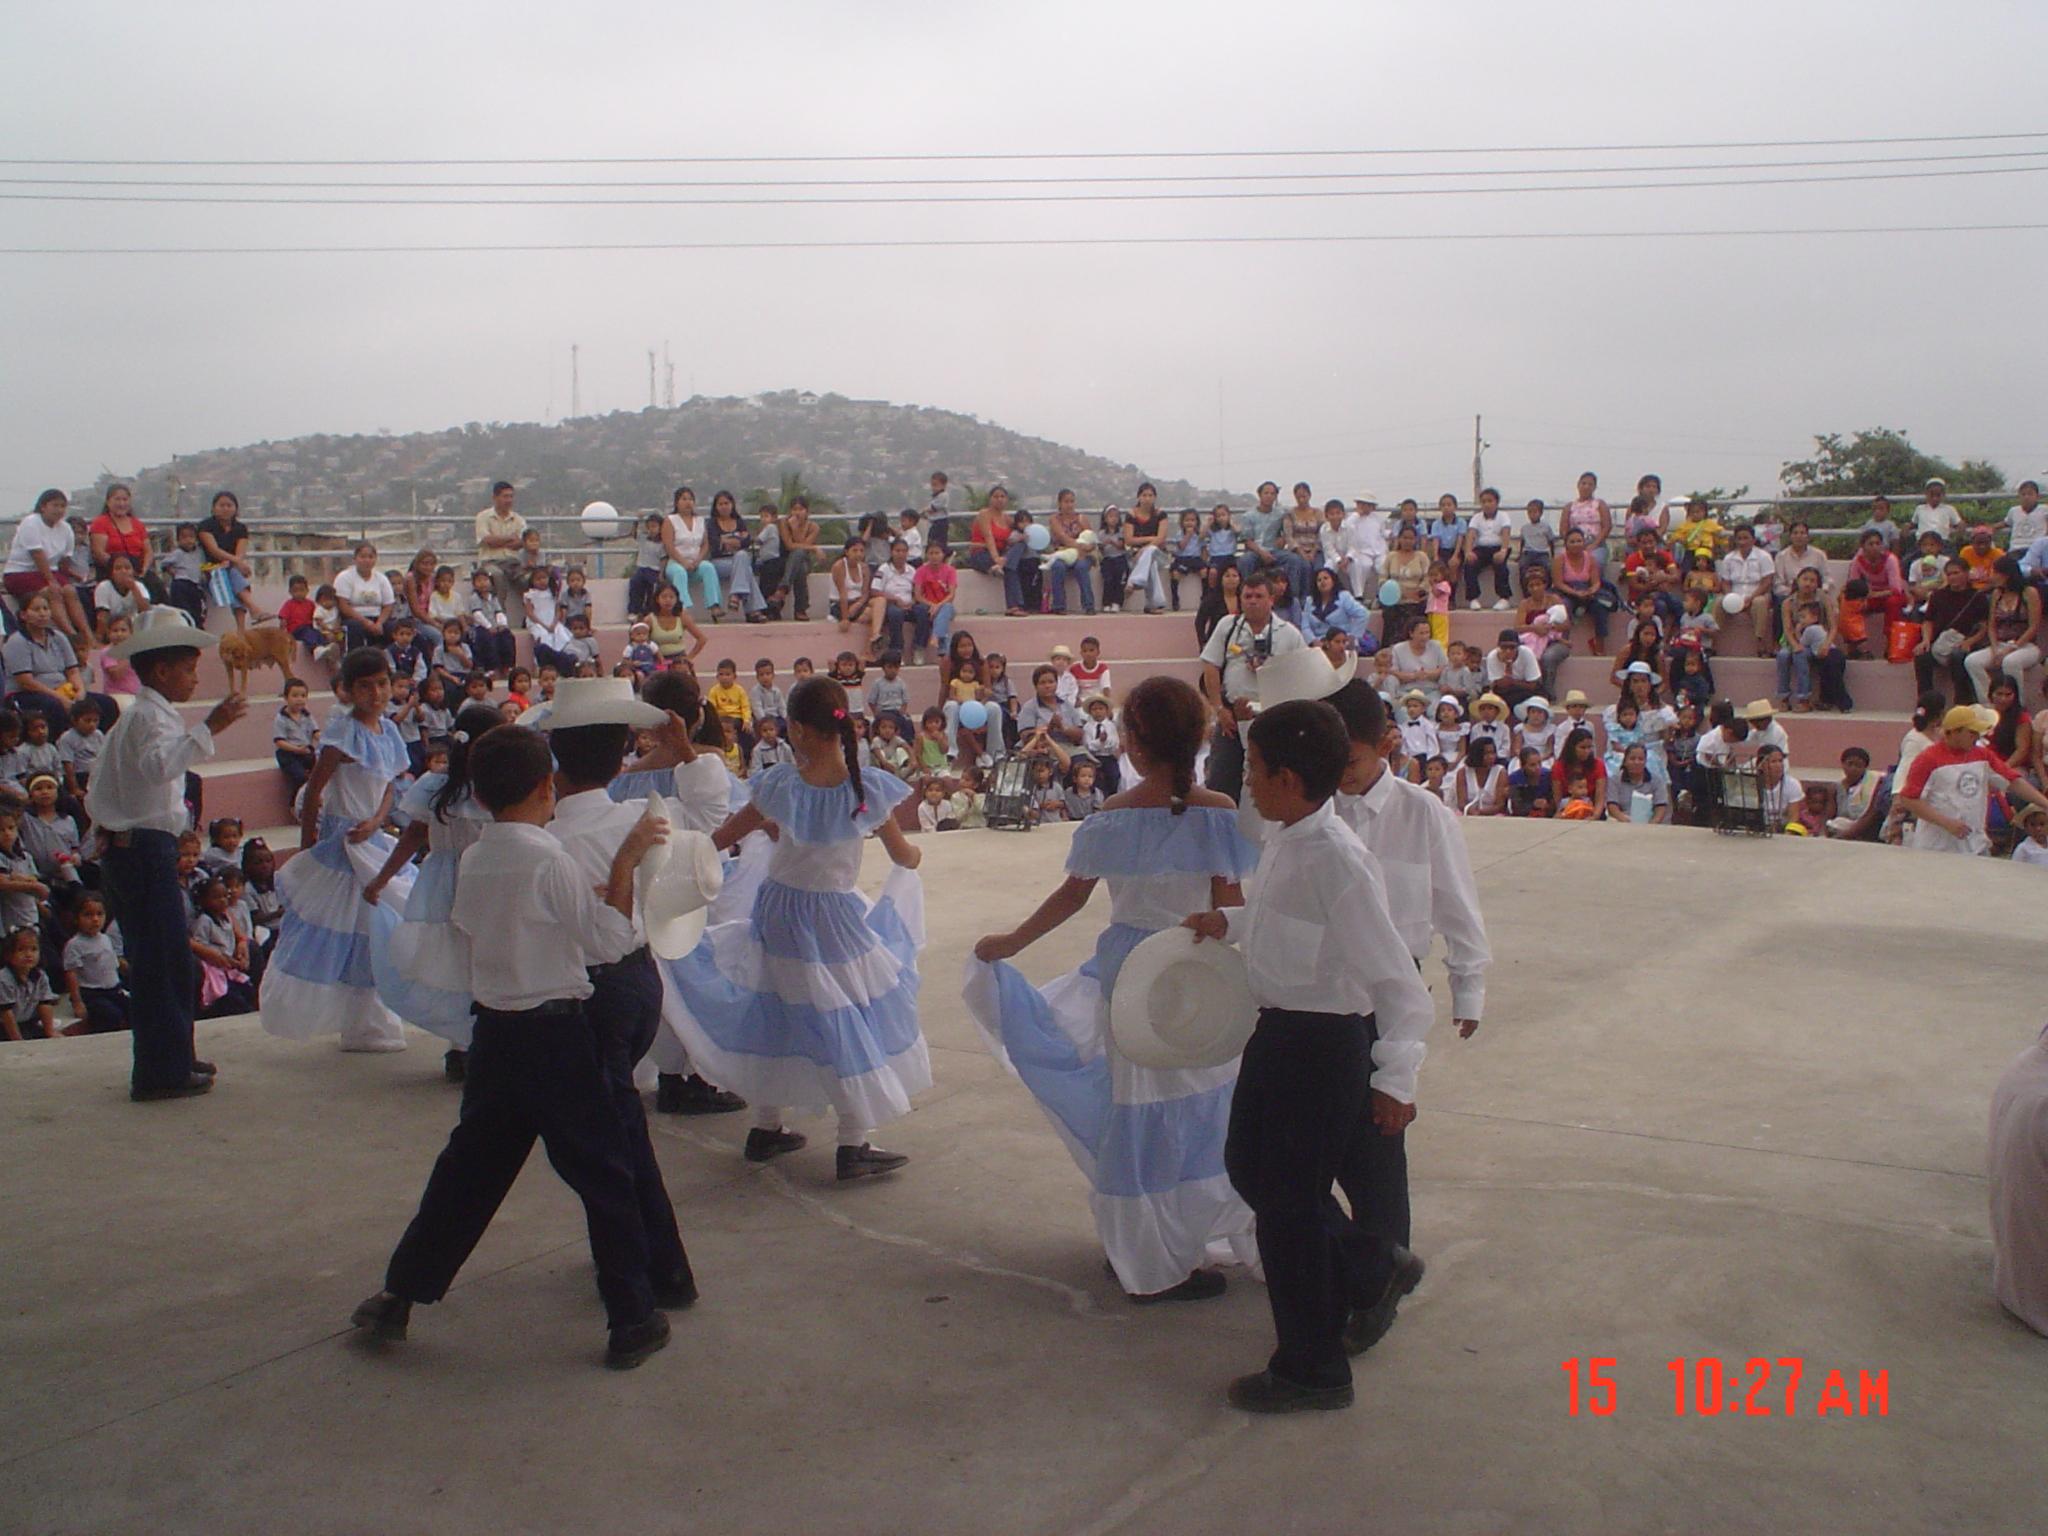 http://upload.wikimedia.org/wikipedia/commons/9/93/Ni%C3%B1os_en_baile_t%C3%ADpico_de_Guayaquil_1.jpg